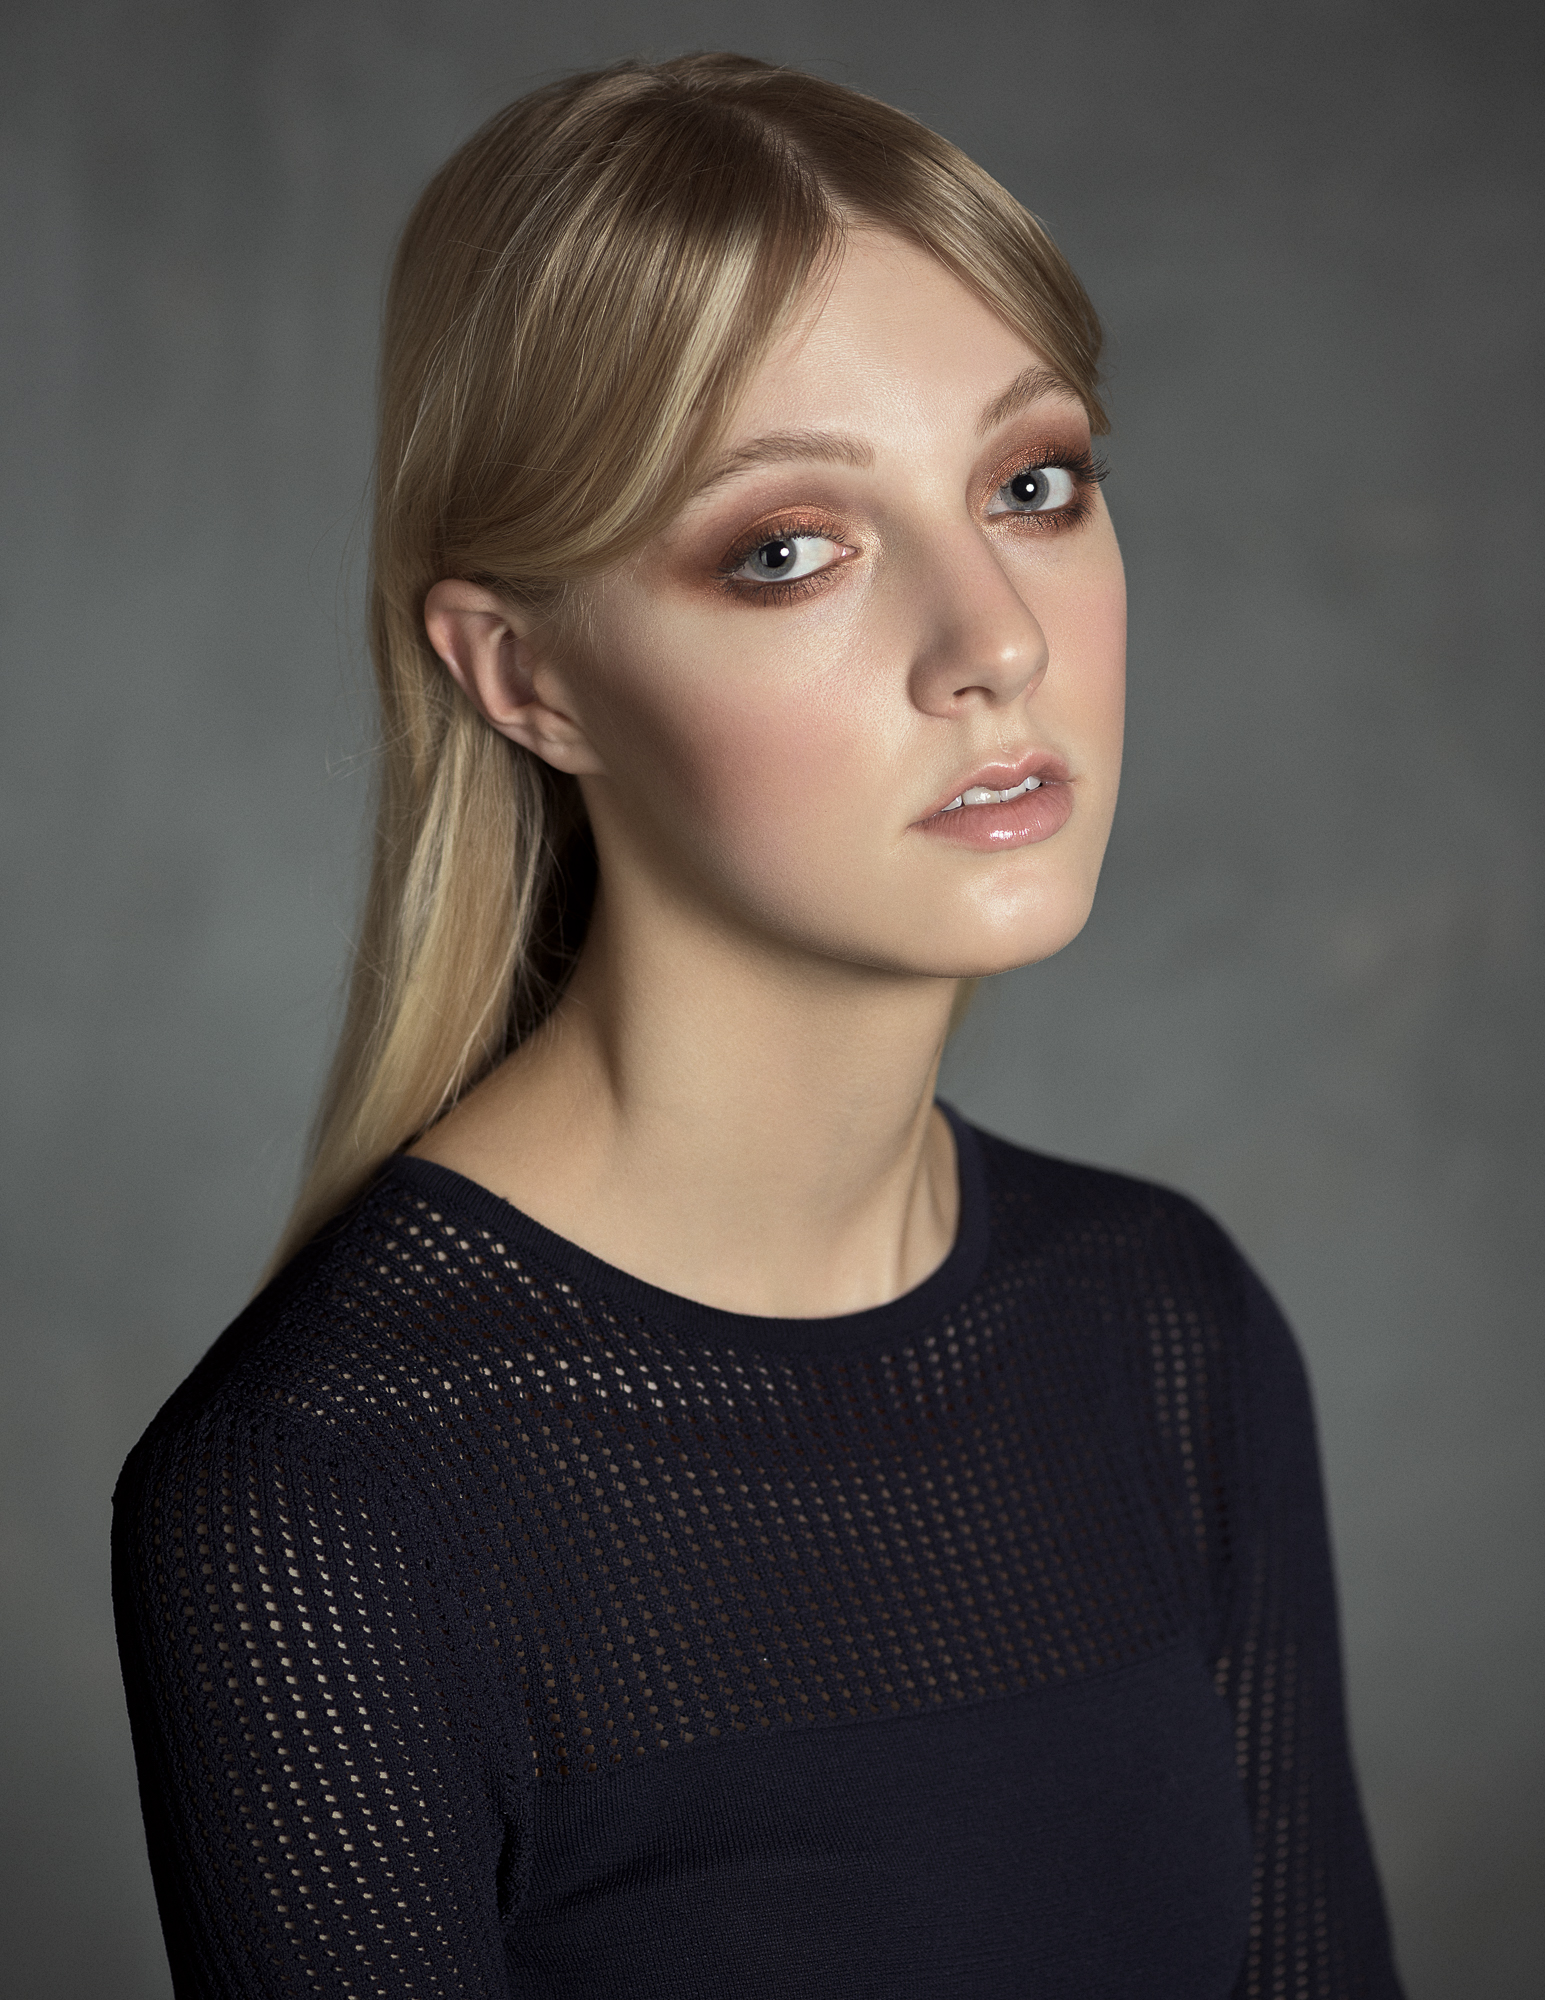 Portrait headshots acting actor professional photographer photography toronto